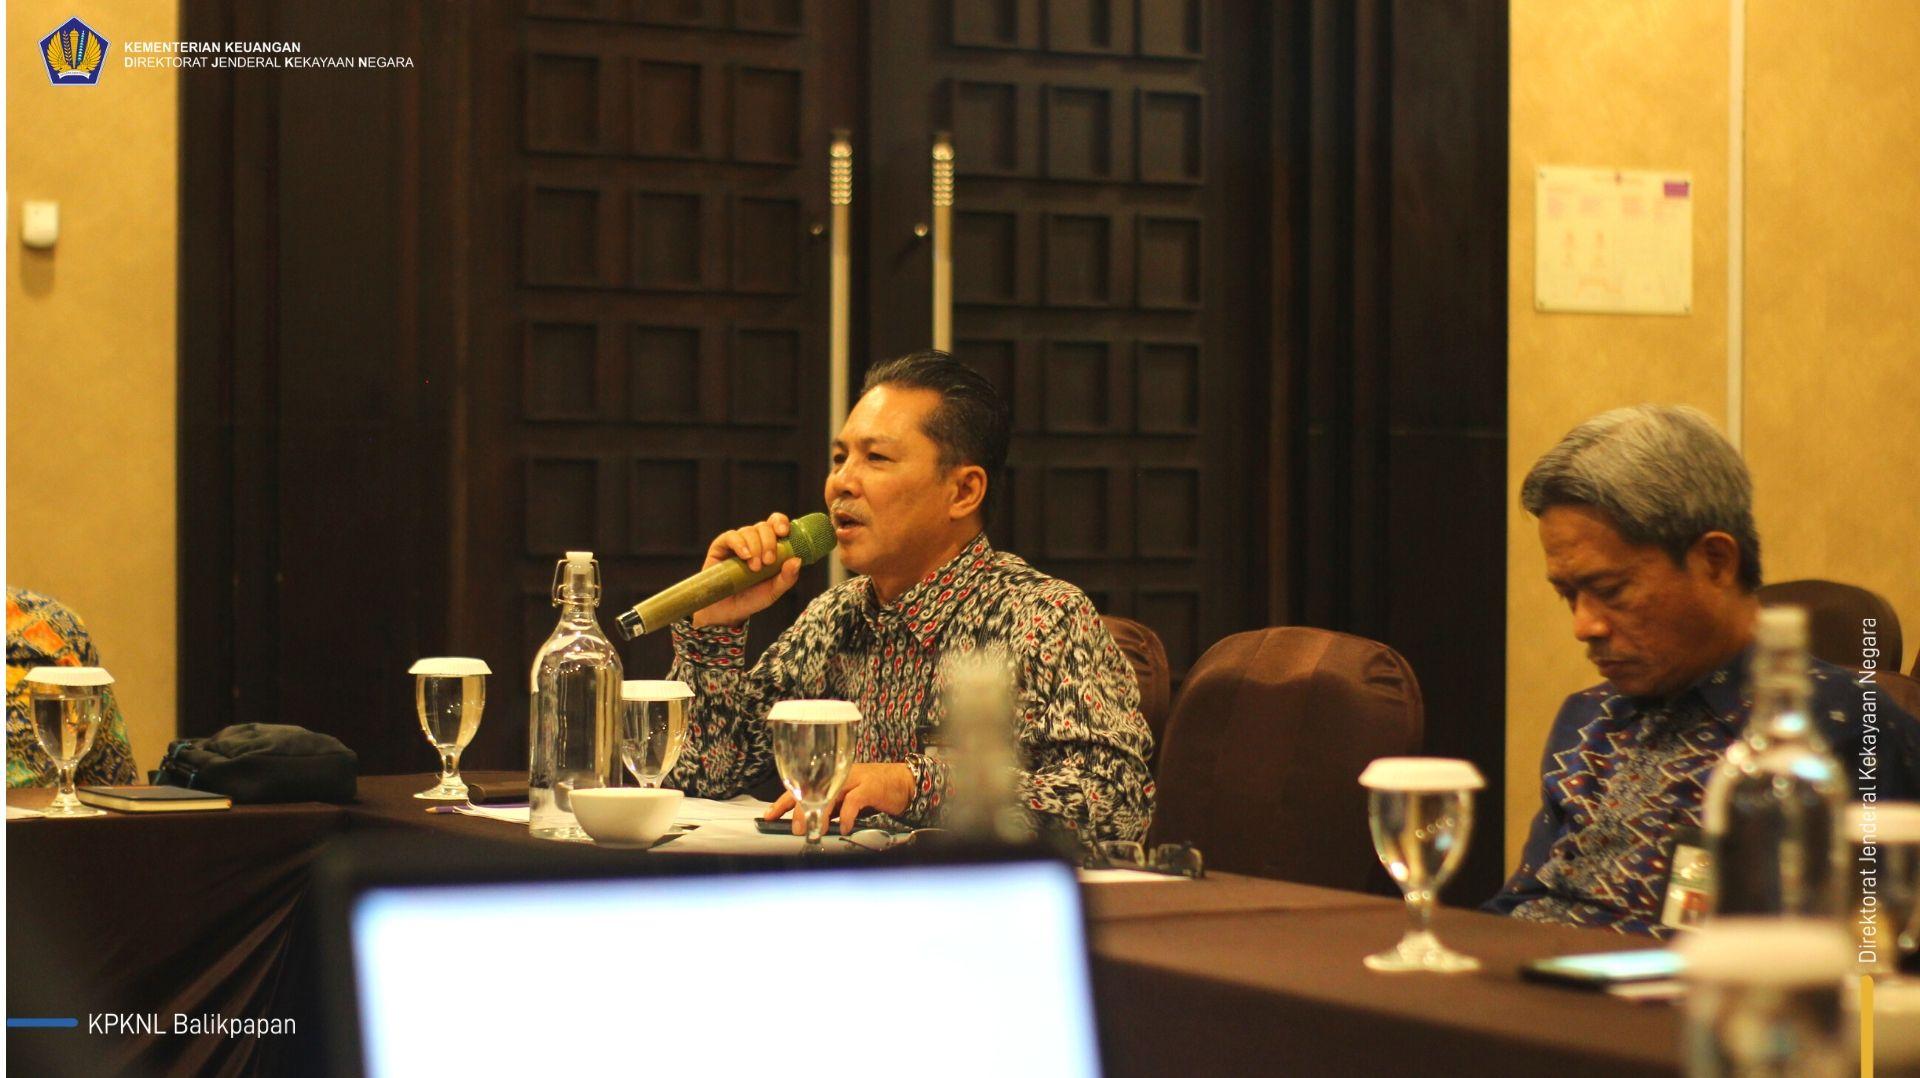 Maksimalkan Penerimaan via Piutang Negara, KPKNL Balikpapan Hadiri Rekon Data dengan Kemenkominfo